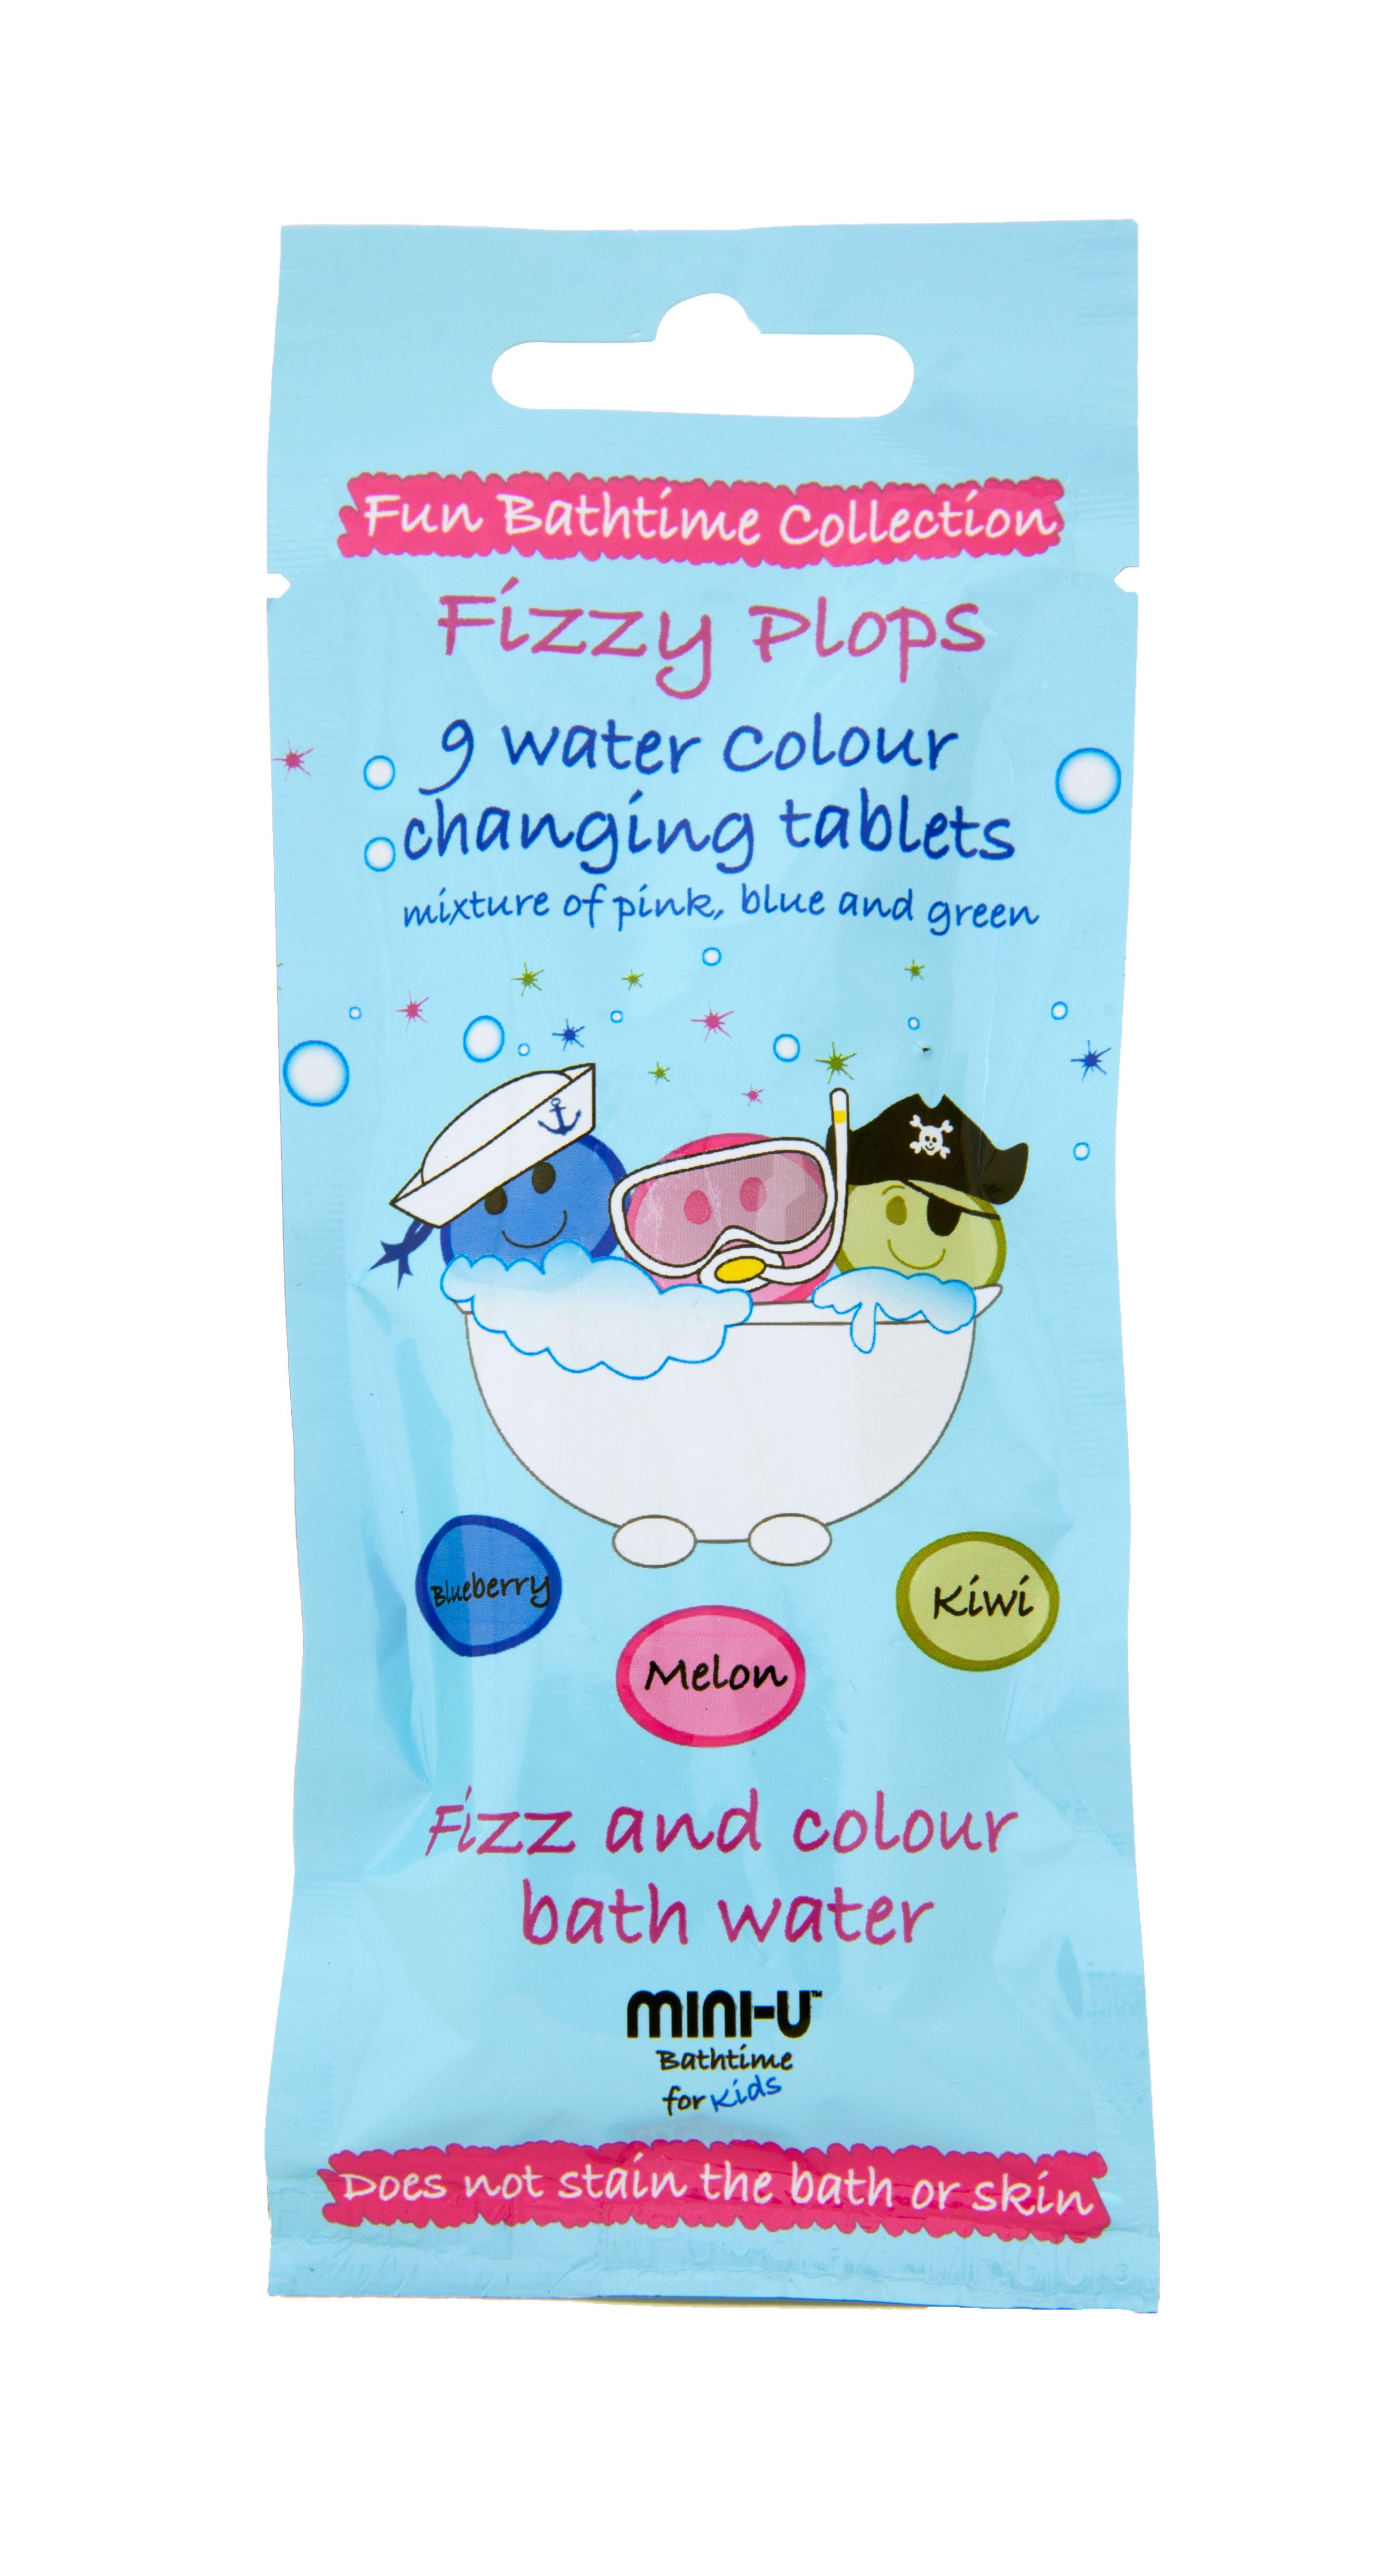 Fizzy Pow Fun Bathtime Box Set - Mini U